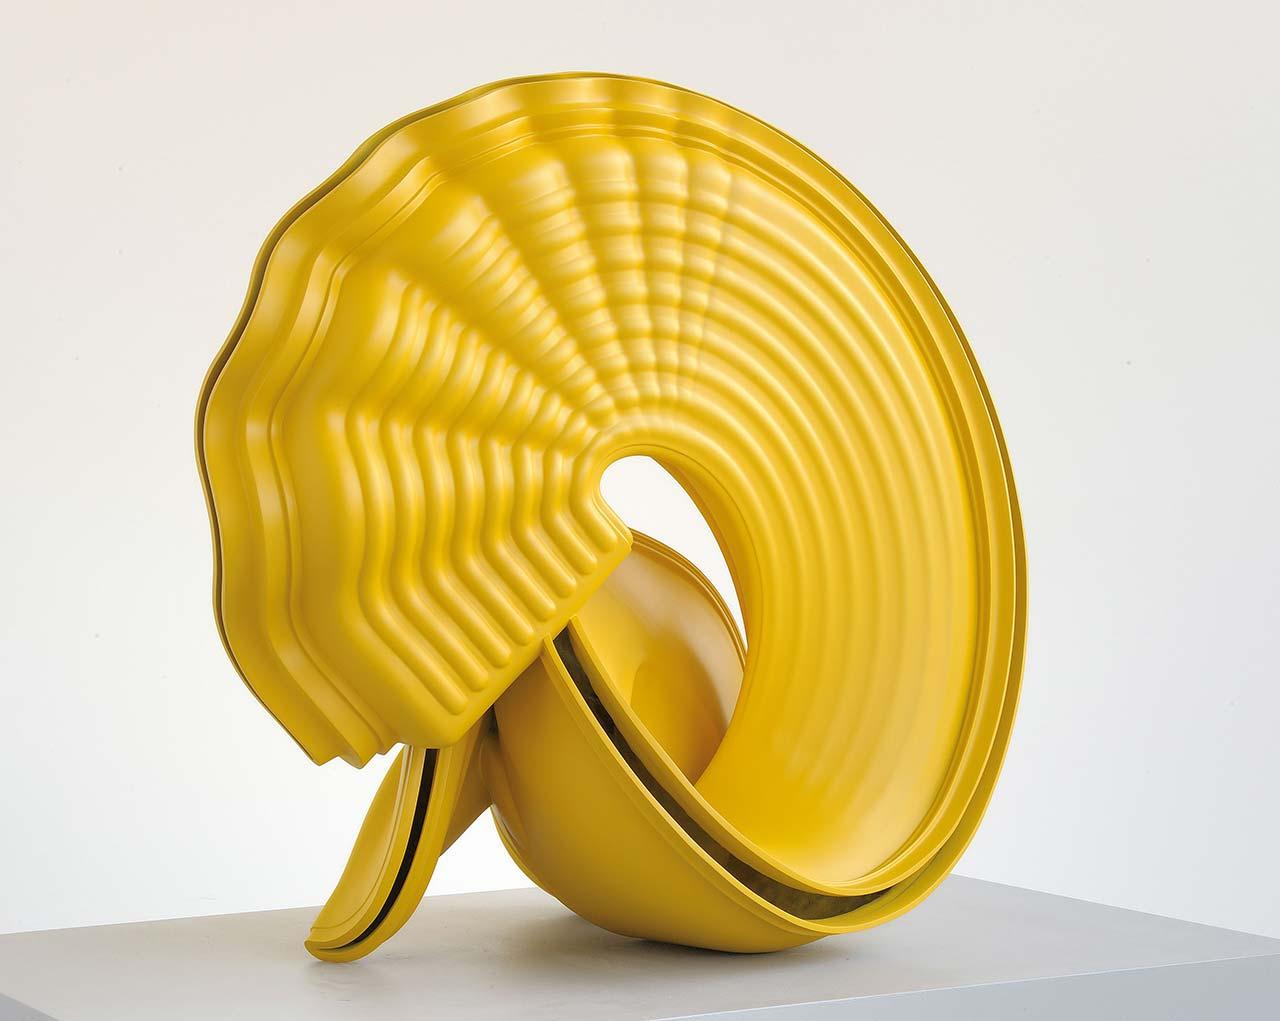 Tony Cragg, Outspan,2007. Bronze. 95 x 100 x 62 cm. Photo by Charles Duprat.